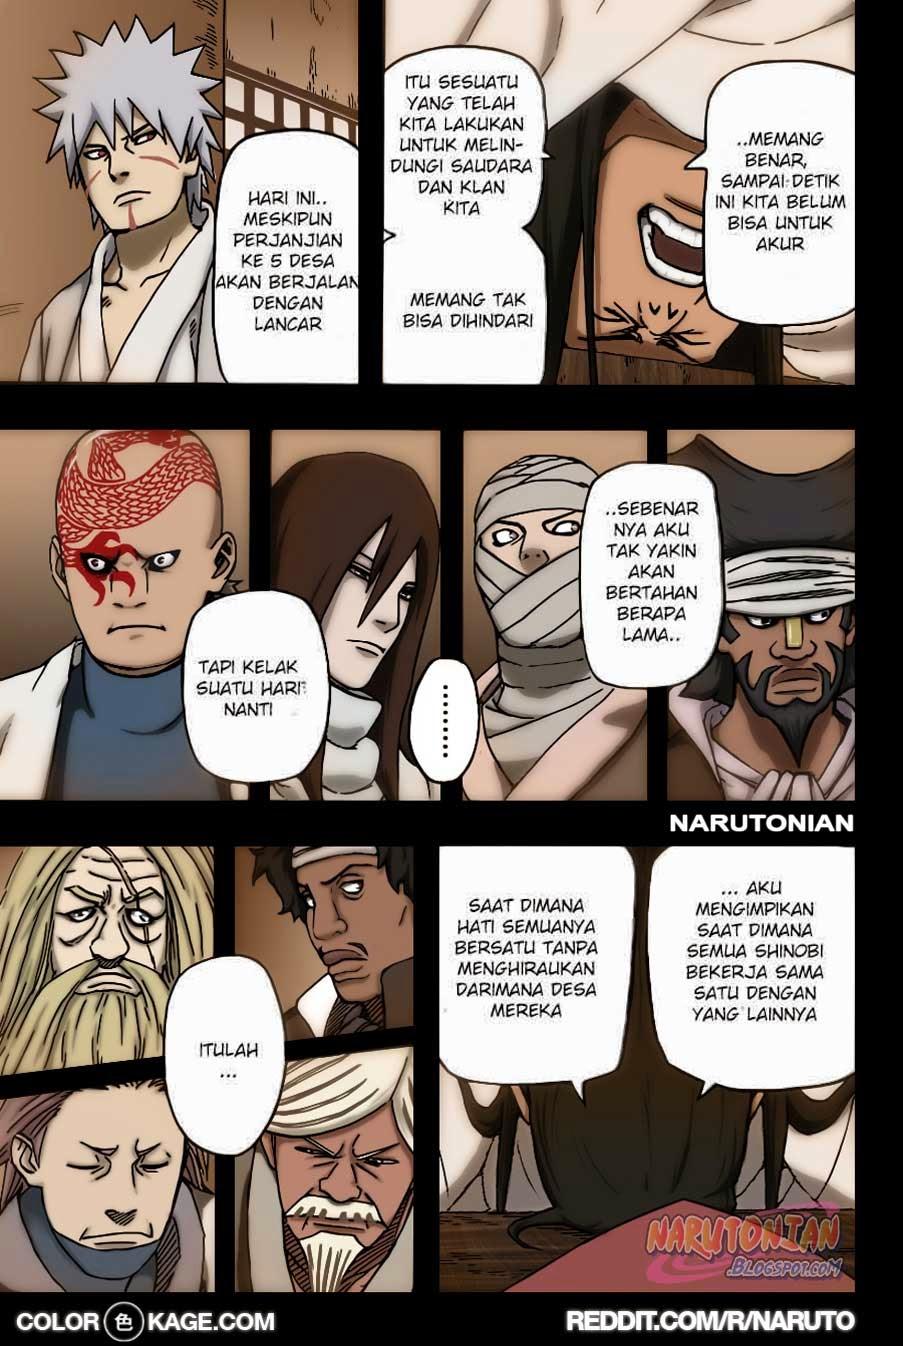 Dilarang COPAS - situs resmi www.mangacanblog.com - Komik naruto berwarna 648 - impian seorang shinobi 649 Indonesia naruto berwarna 648 - impian seorang shinobi Terbaru 13|Baca Manga Komik Indonesia|Mangacan